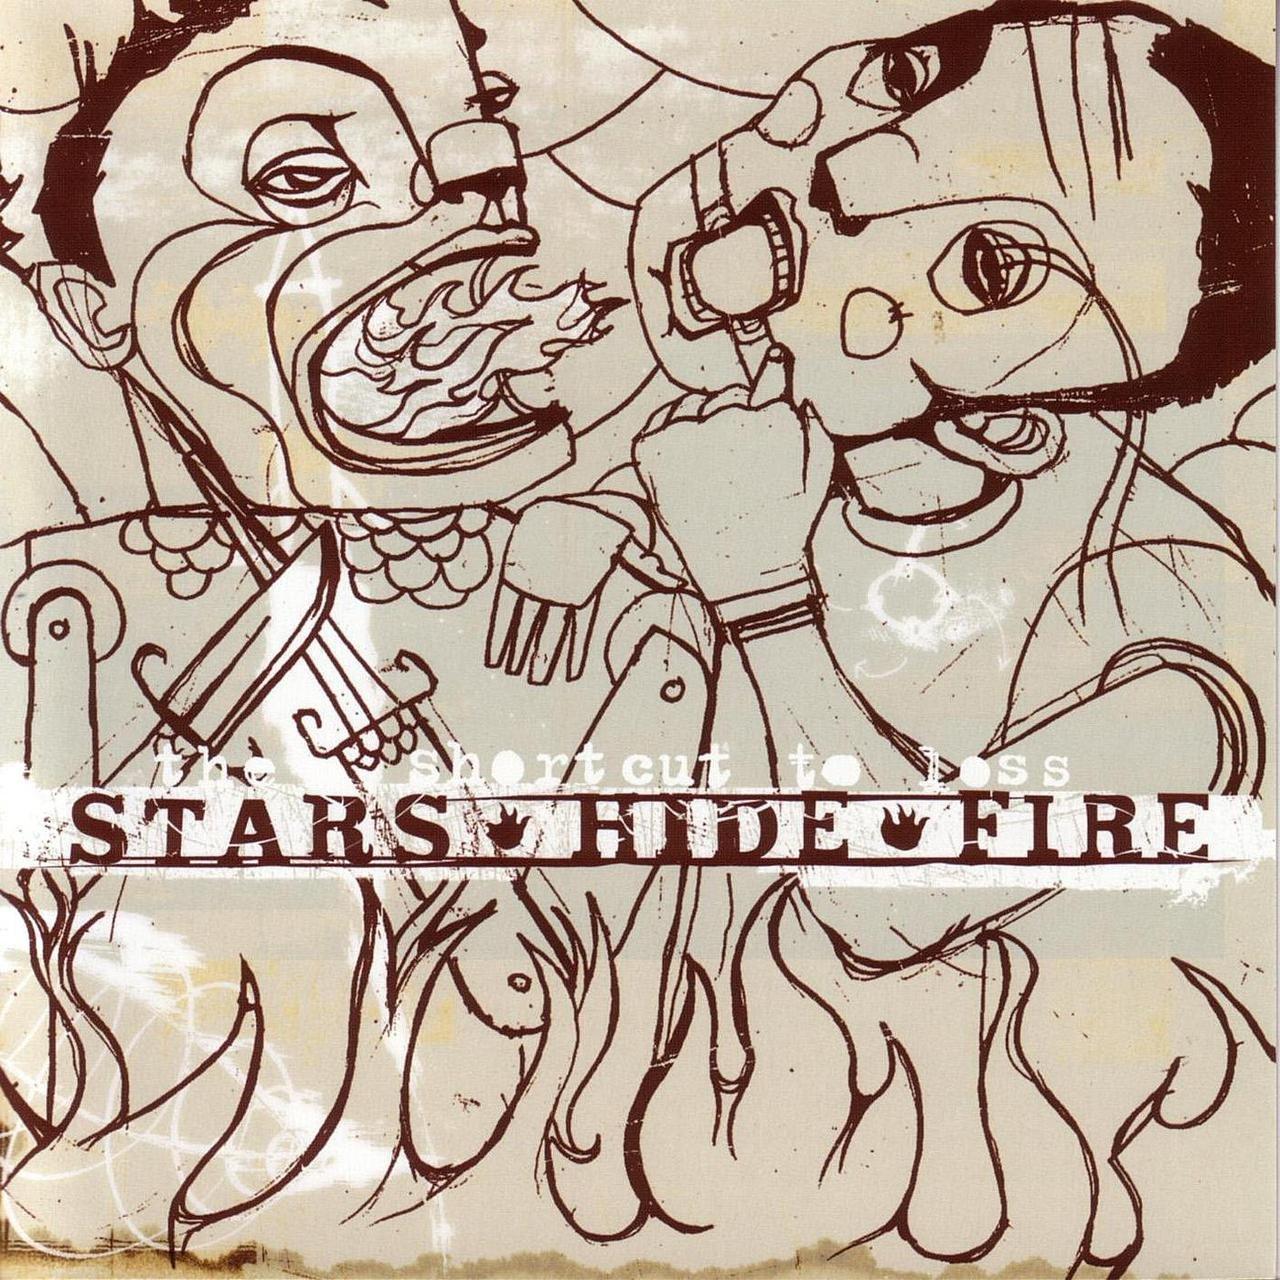 stars_hide_fire.jpg